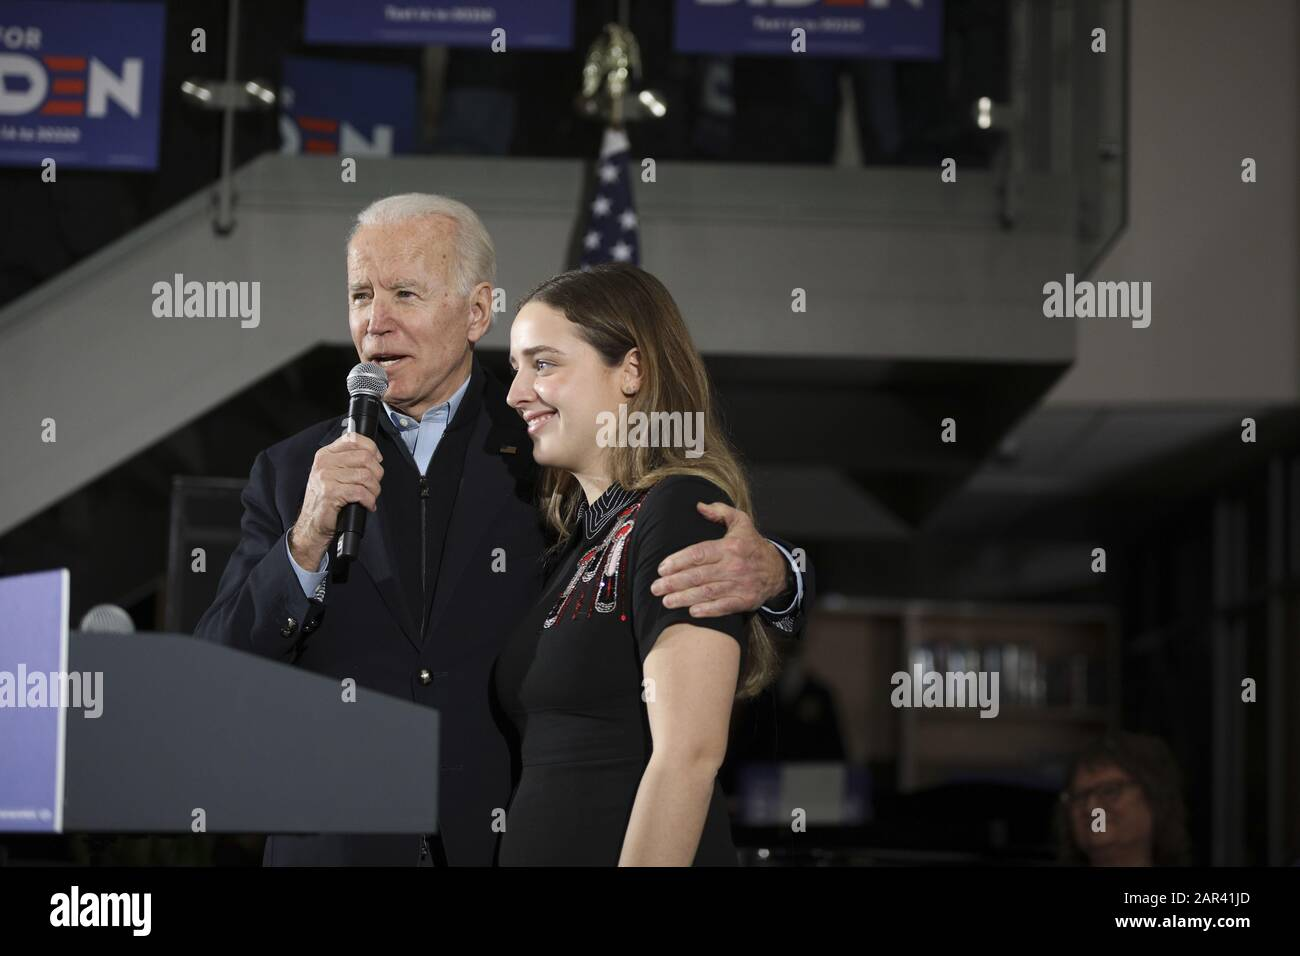 Ankeny Iowa Usa 25th Jan 2020 Former Vice President Joe Biden Introduces His Granddaughter Before Beginning